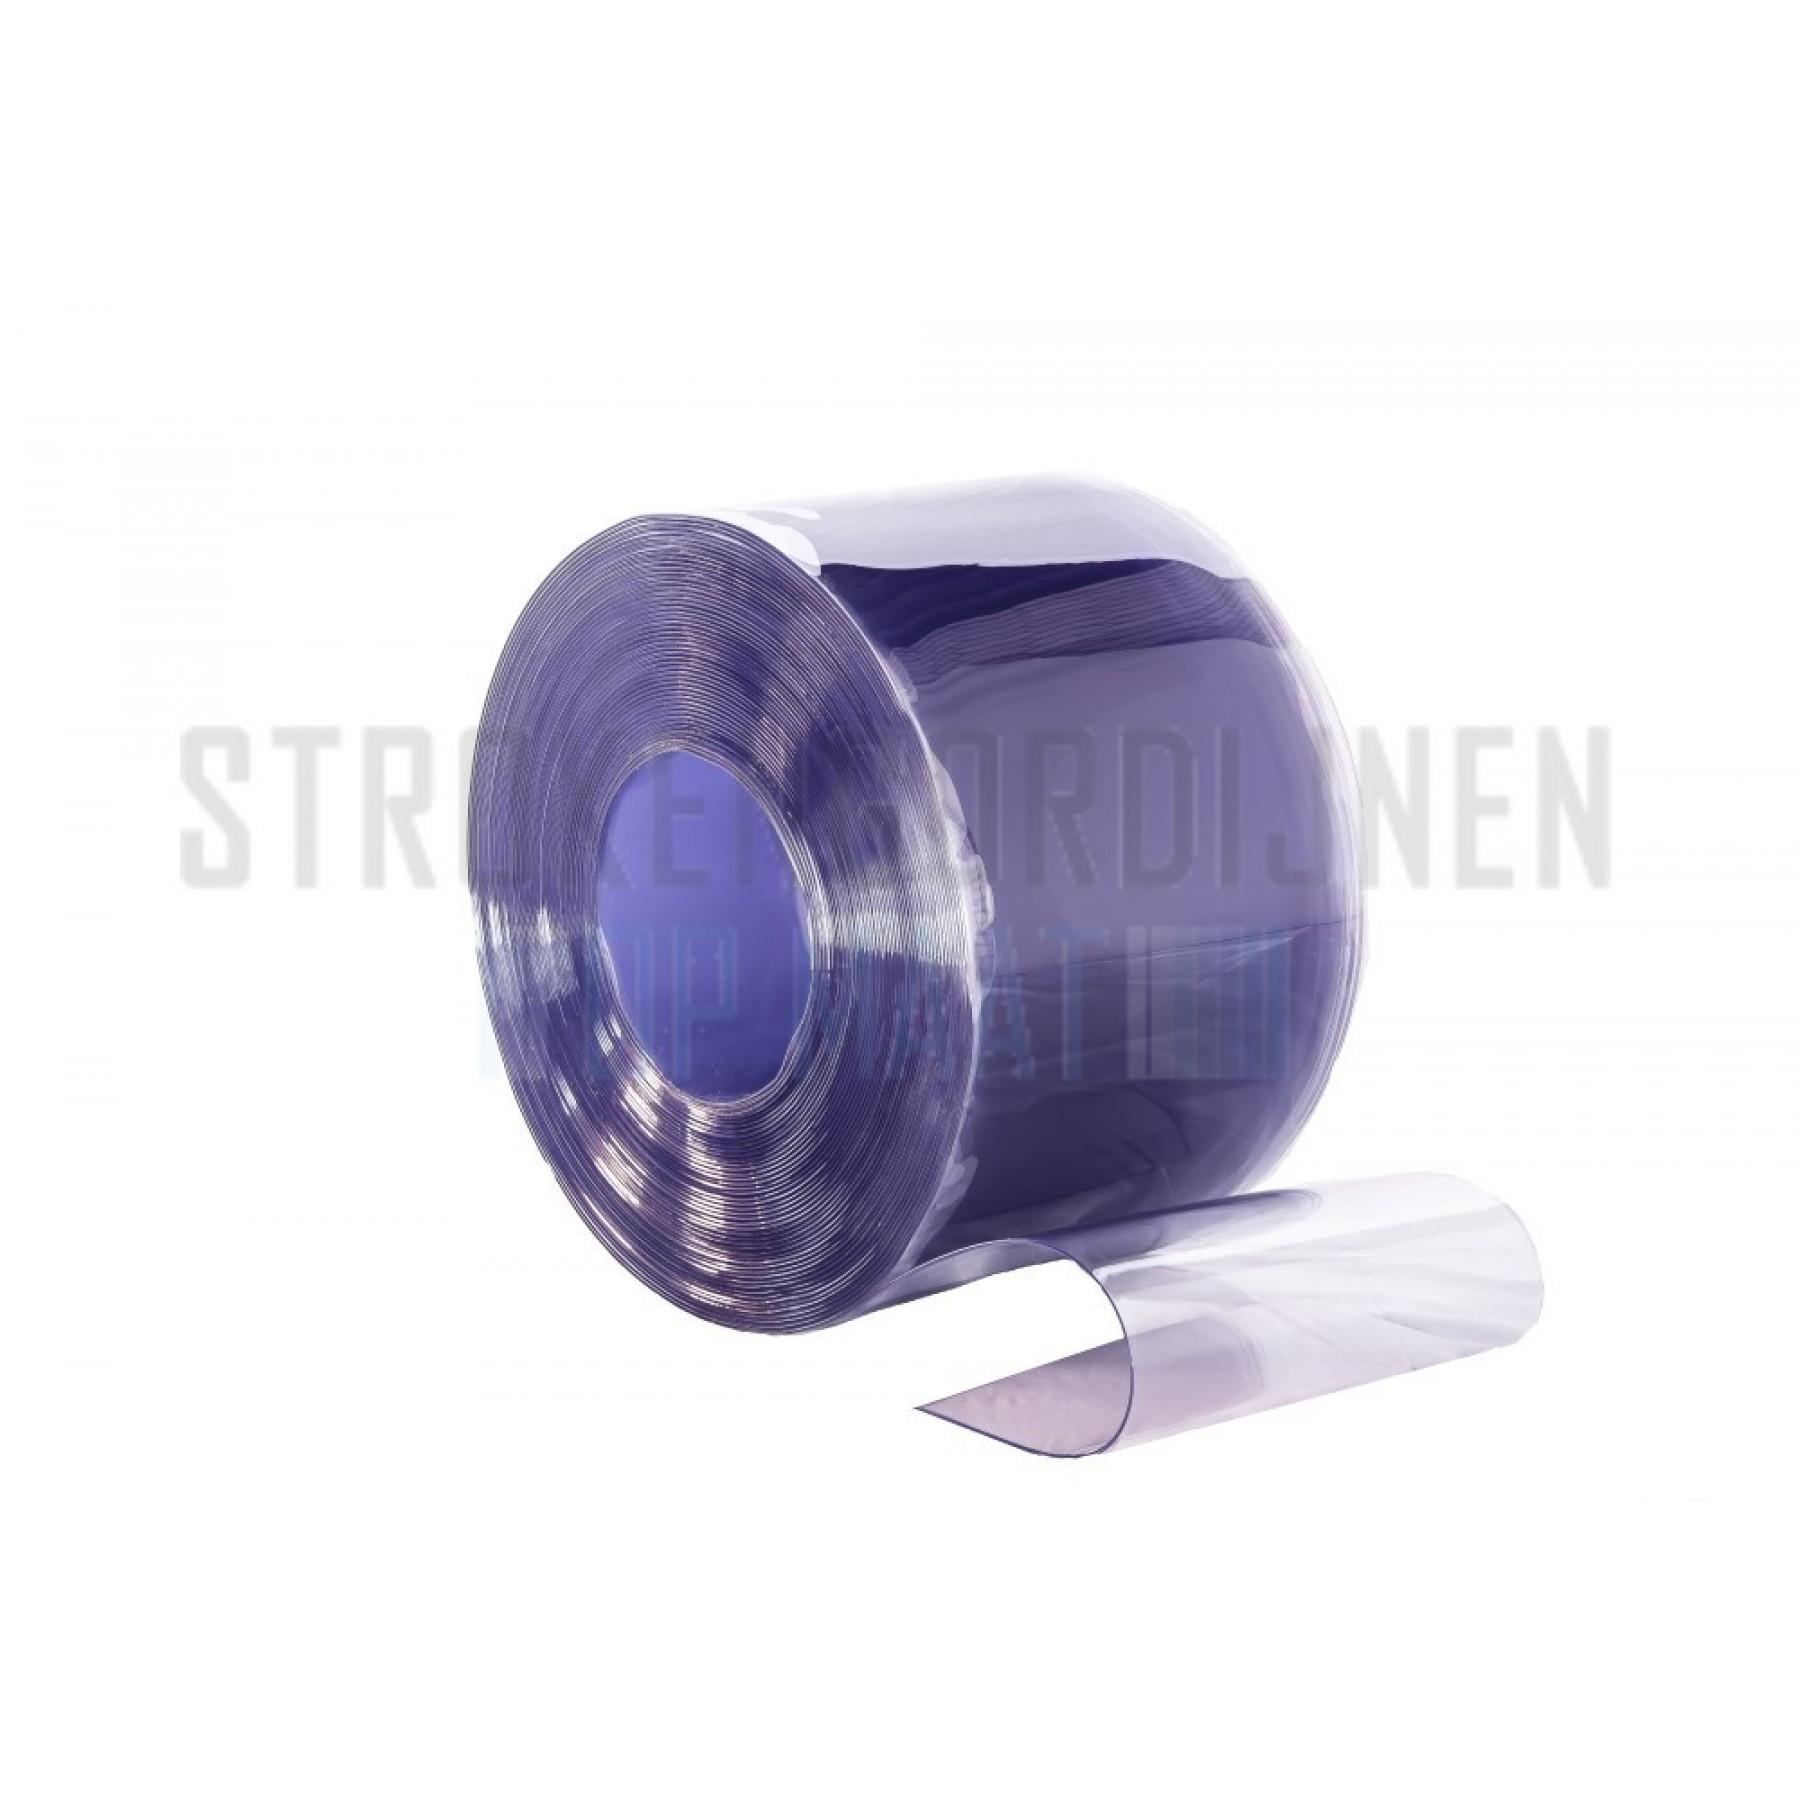 PVC Rolle 300mm breit, 3mm dick, 50 meter lang, transparent